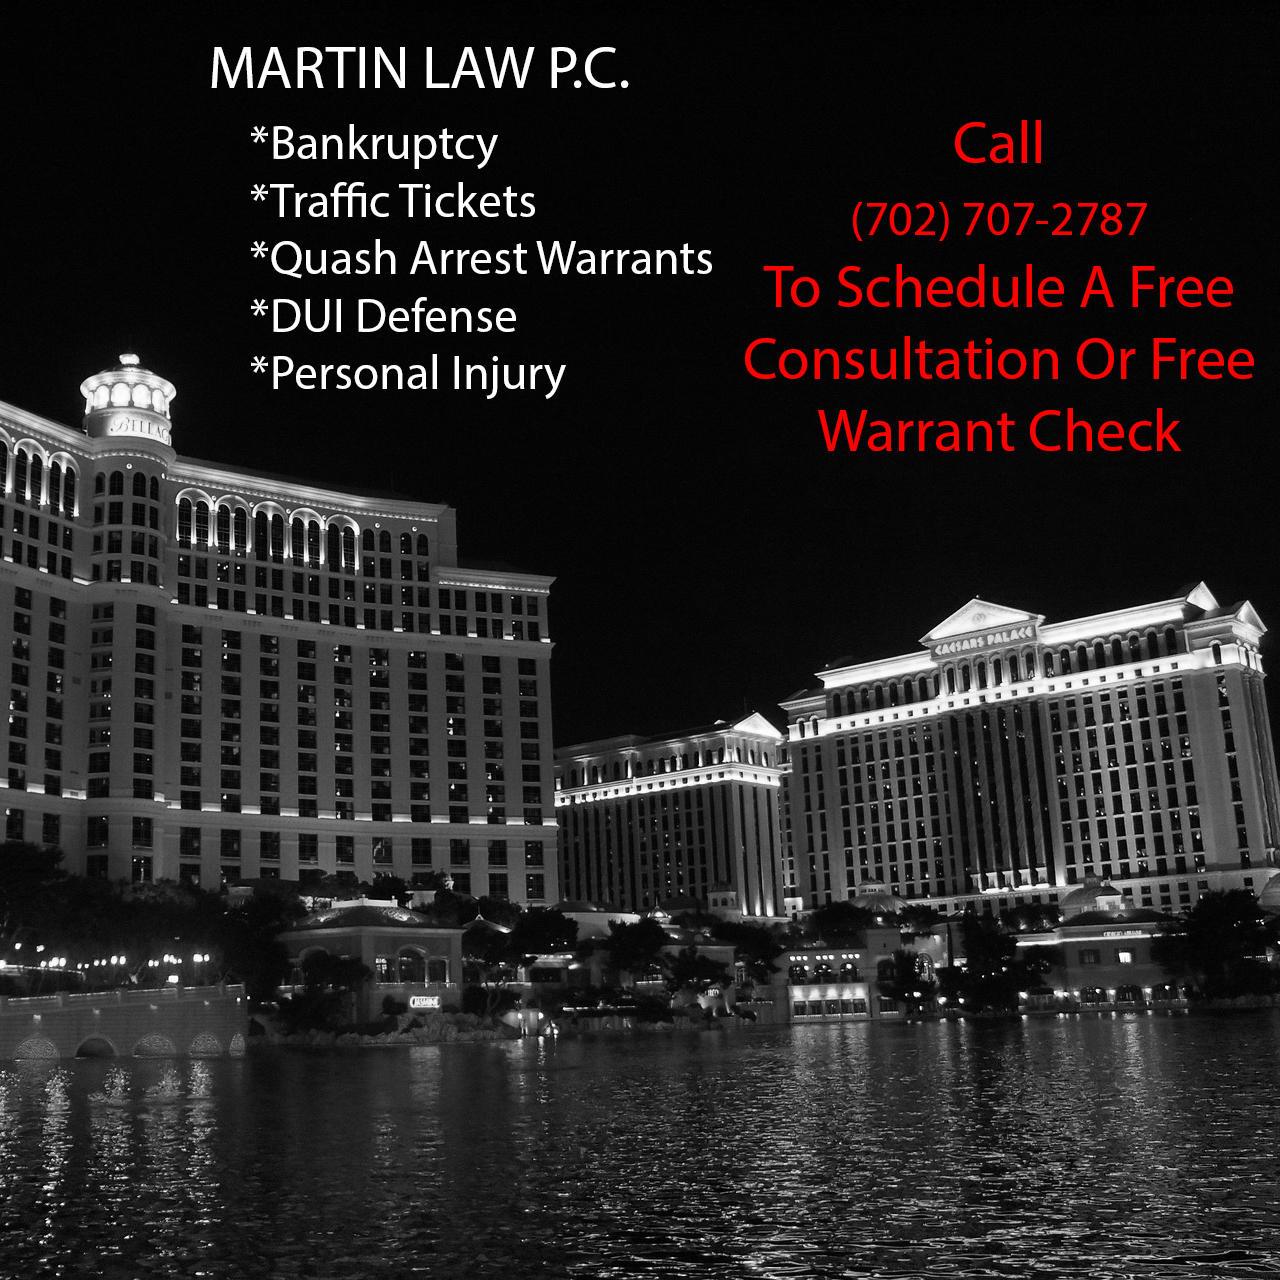 Martin Law P.C. image 3